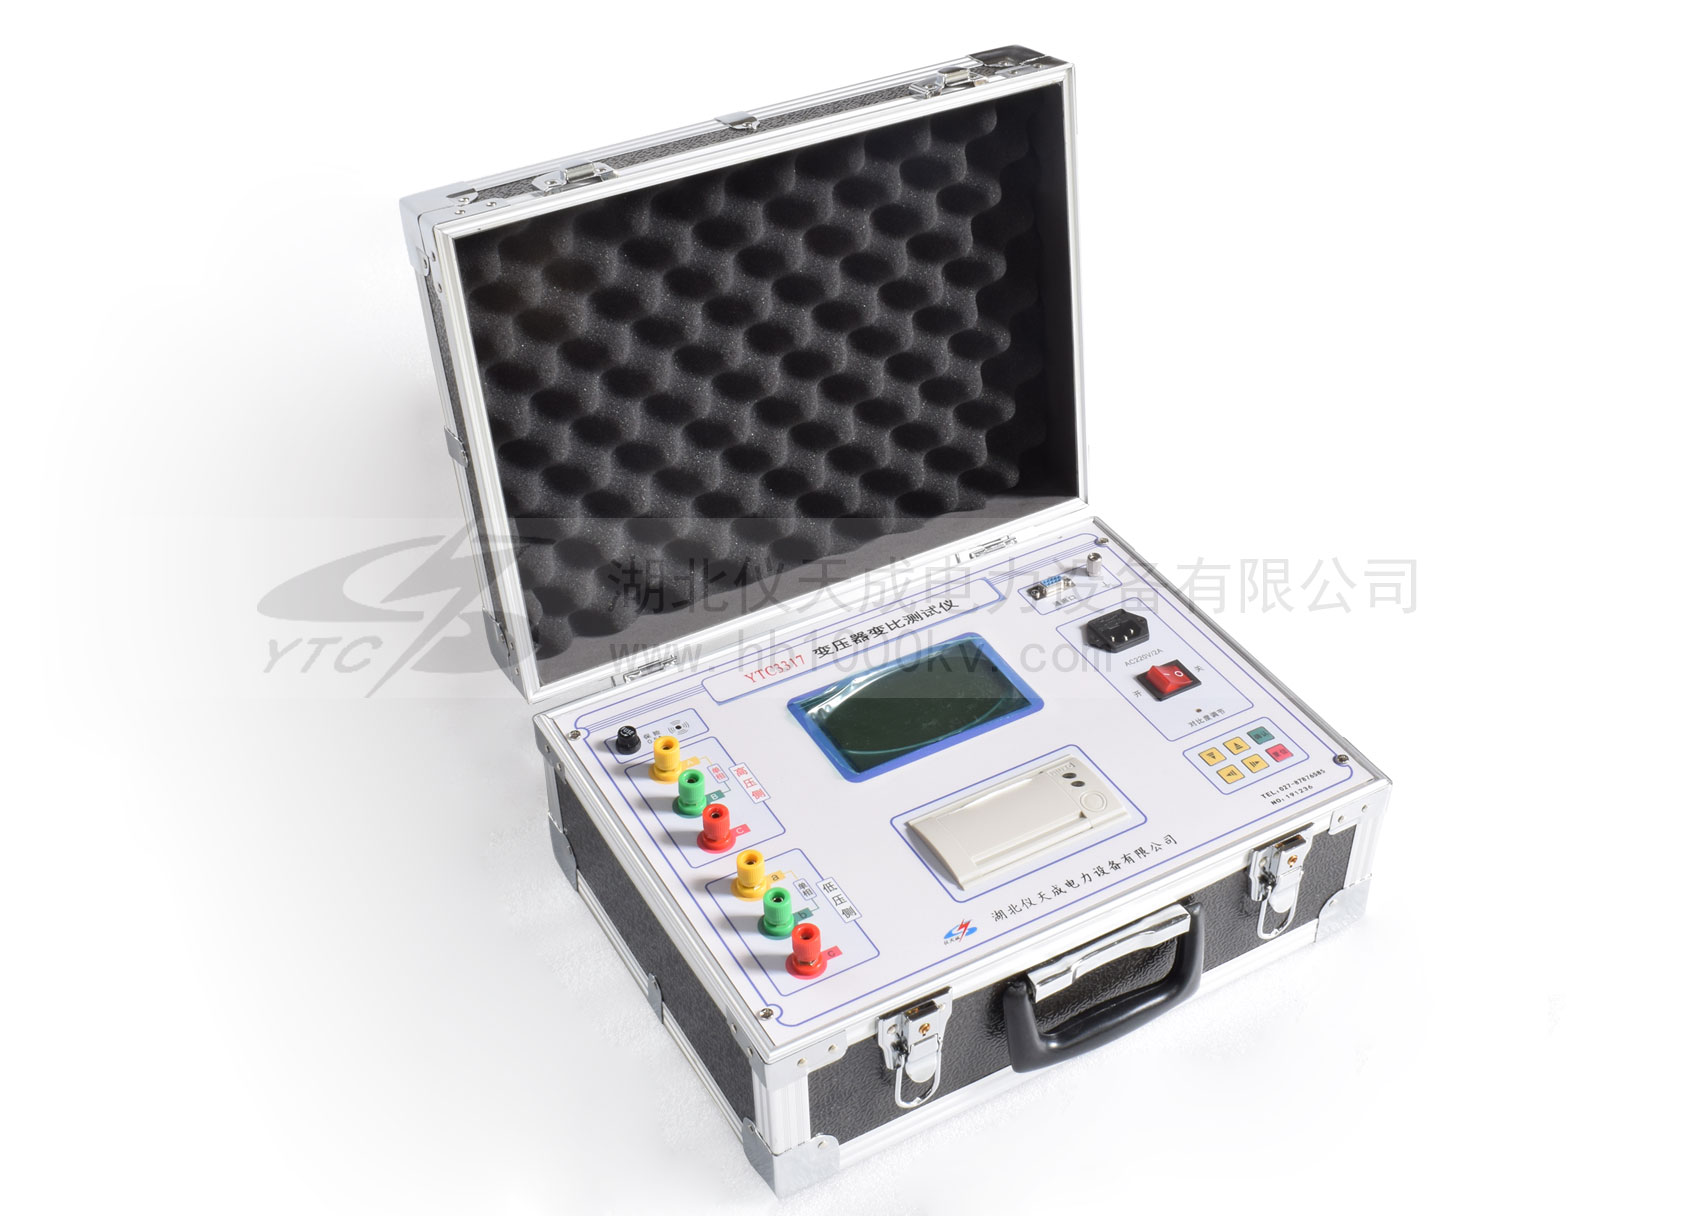 YTC3317全自dong变比组别测试仪